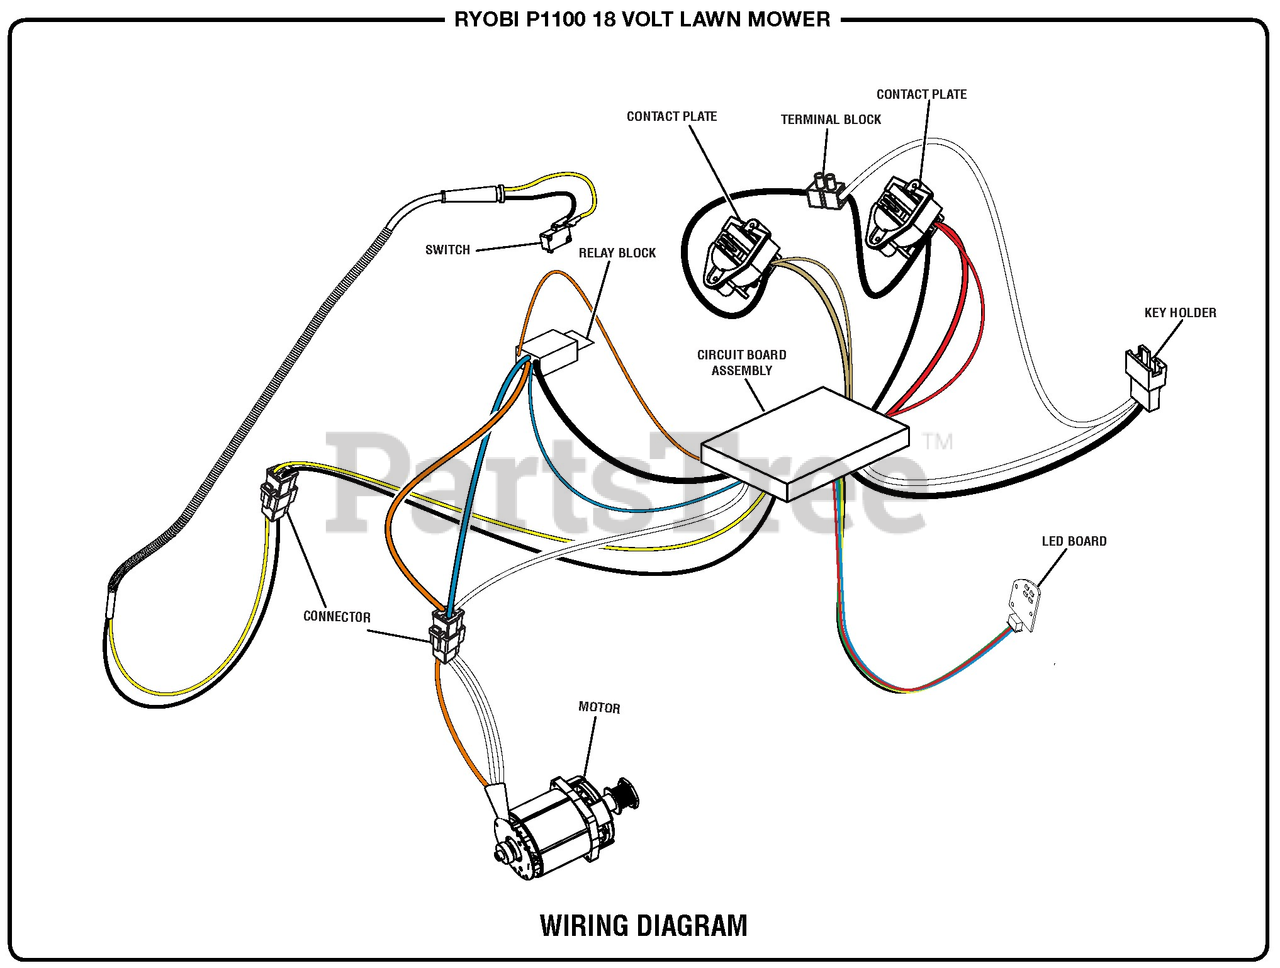 [SODI_2457]   Ryobi P 1100 (107178001) - Ryobi Walk-Behind Mower, 18 Volt Wiring Diagram  B Parts Lookup with Diagrams | PartsTree | Cub Cadet Wiring Diagram For 1100 |  | PartsTree